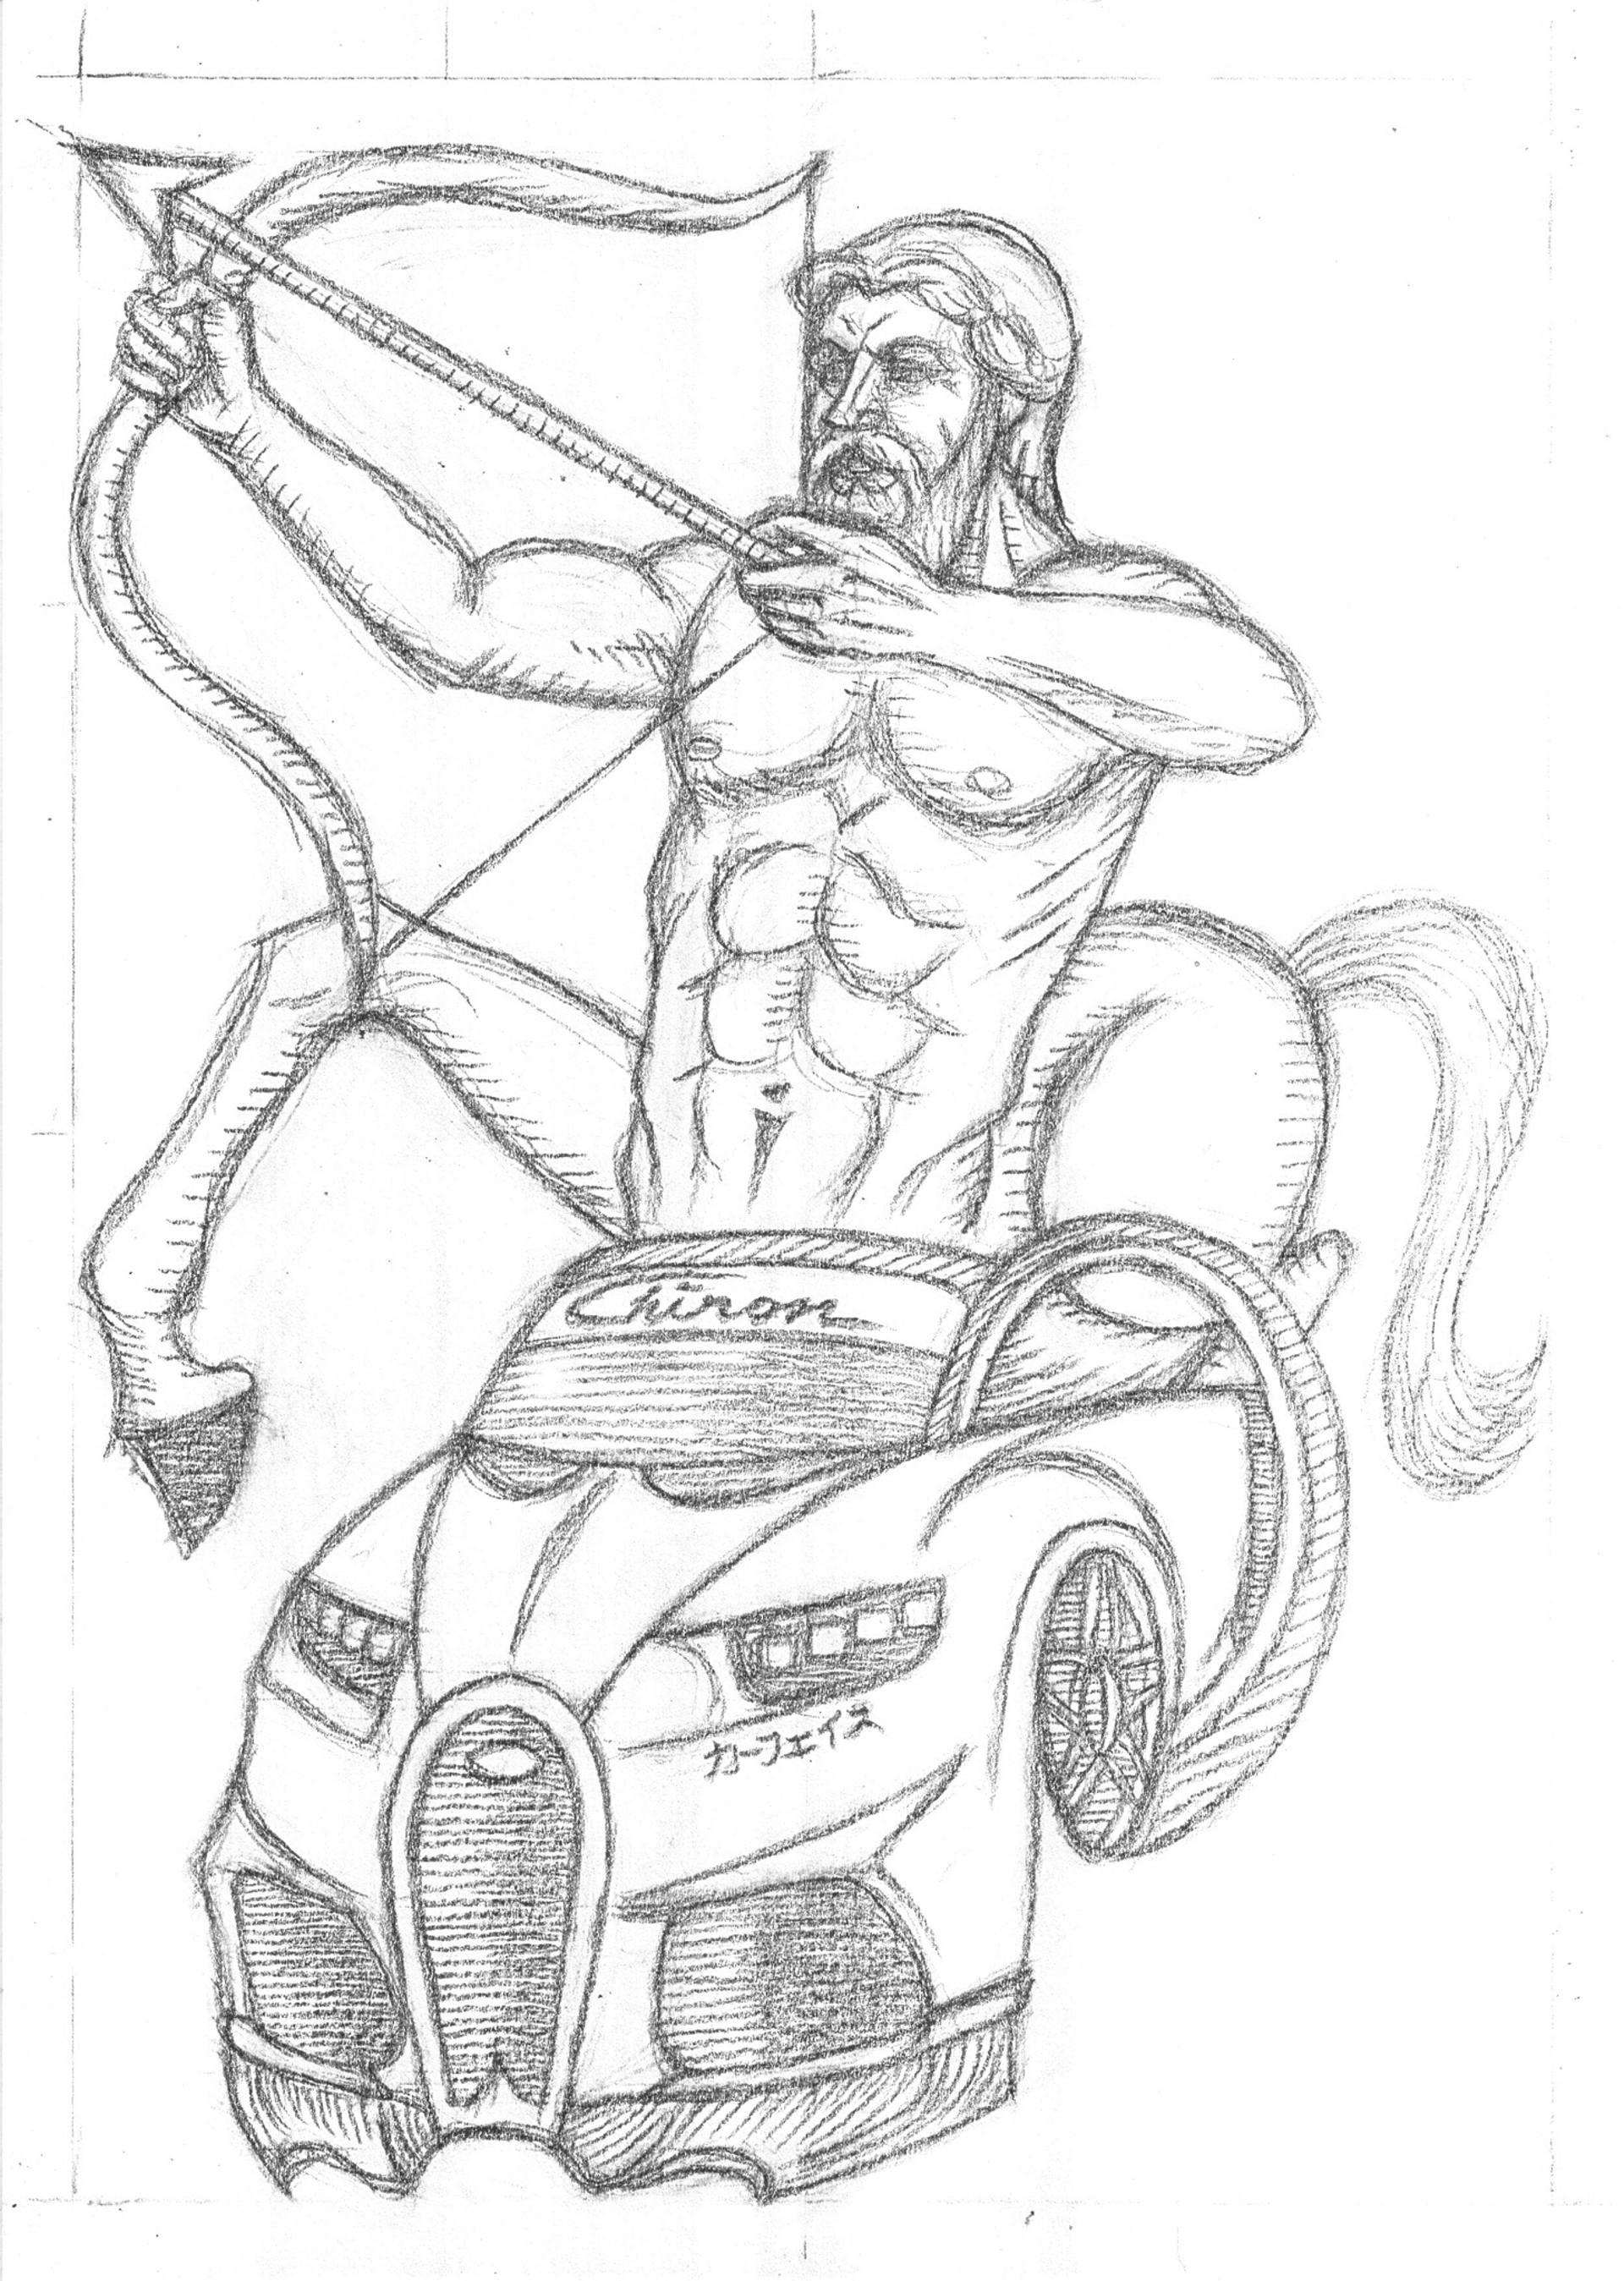 Car motor drawing at getdrawings free for personal use car